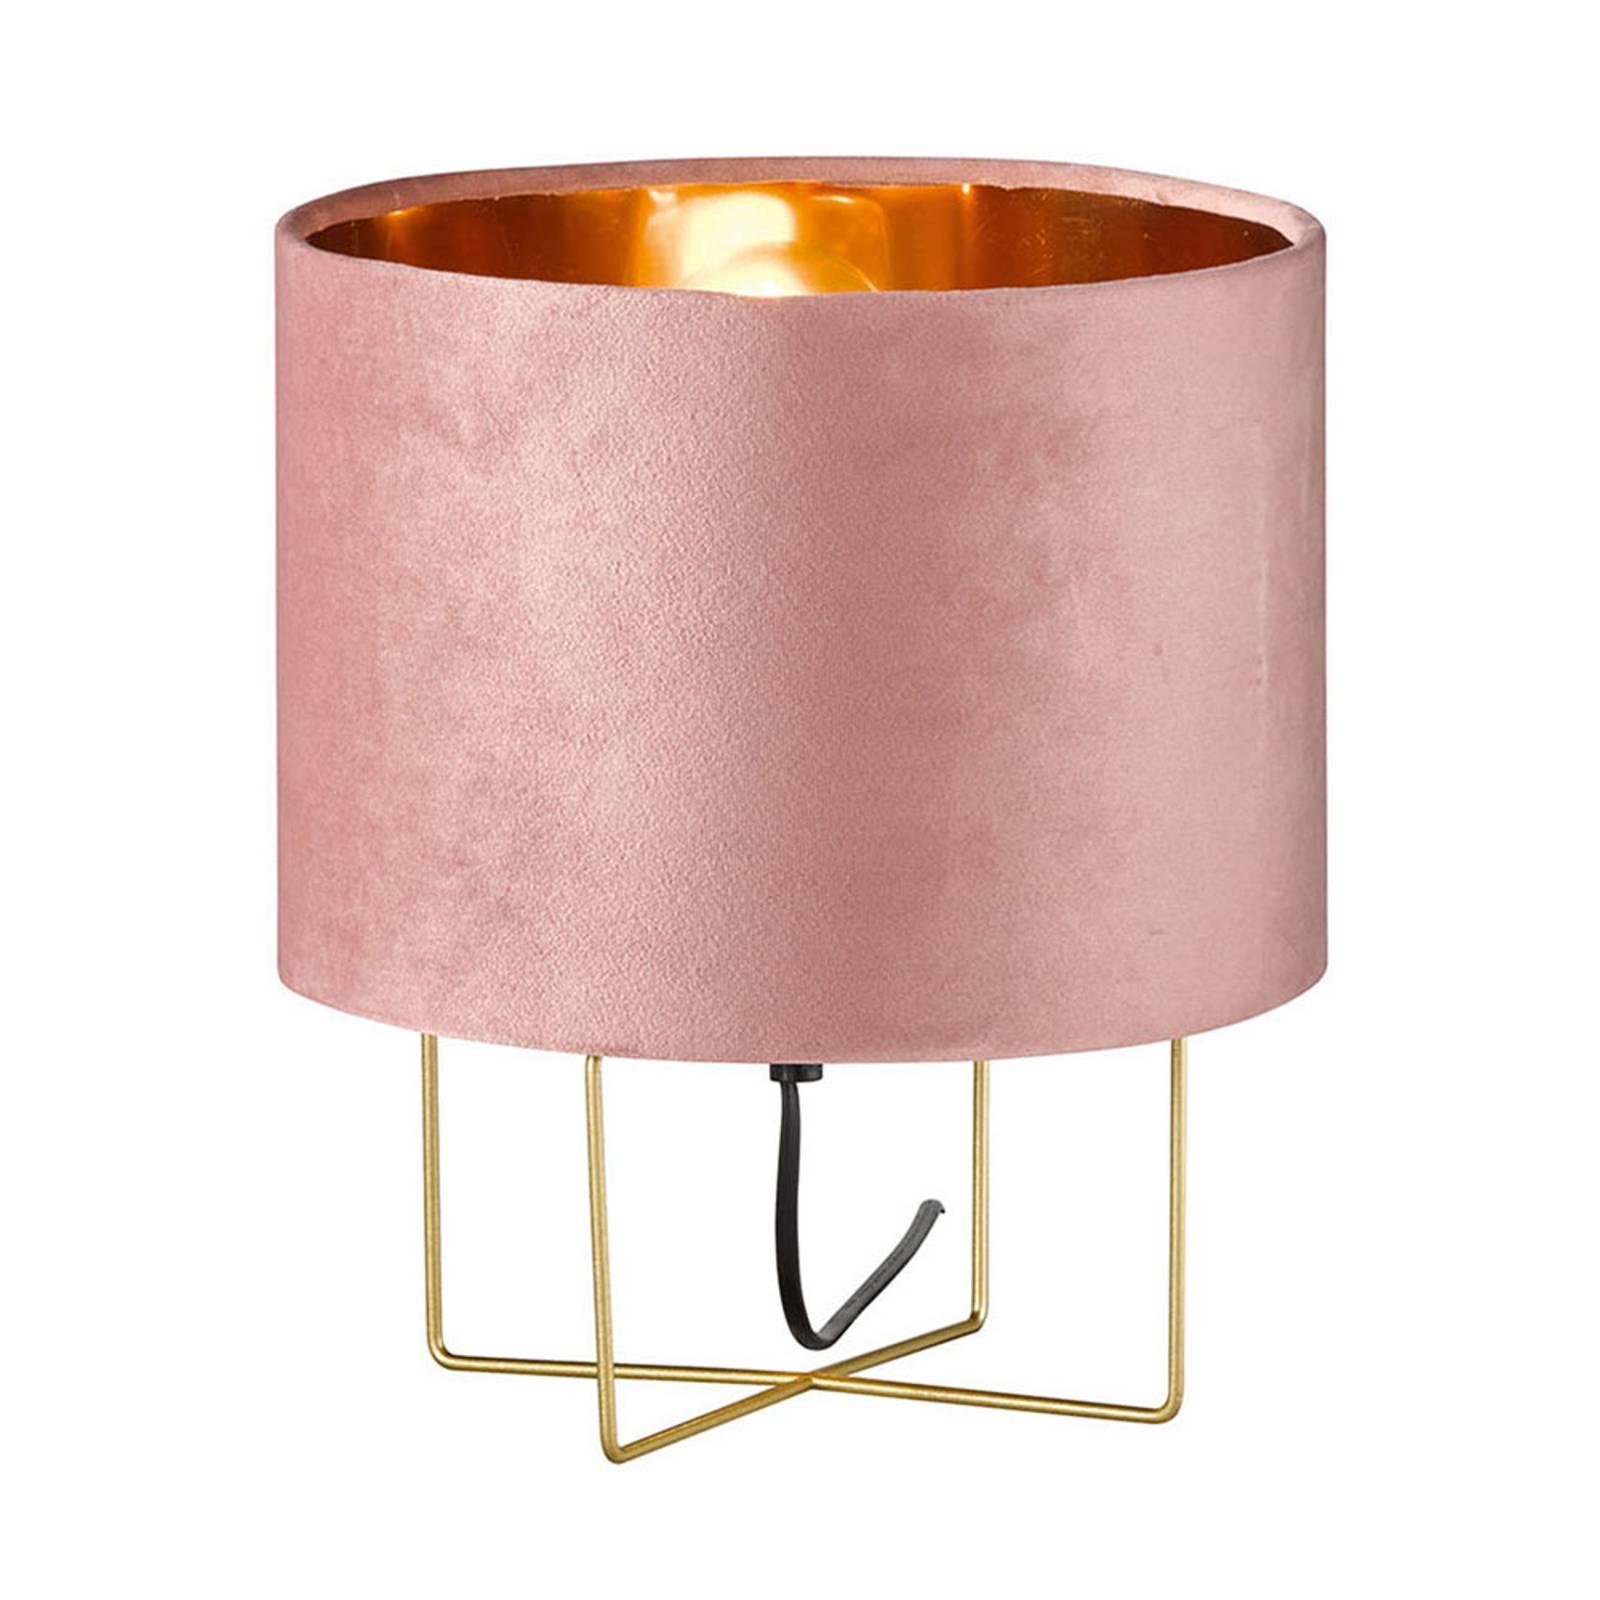 Tafellamp Aura, fluwelen kap, hoogte 32 cm, roze